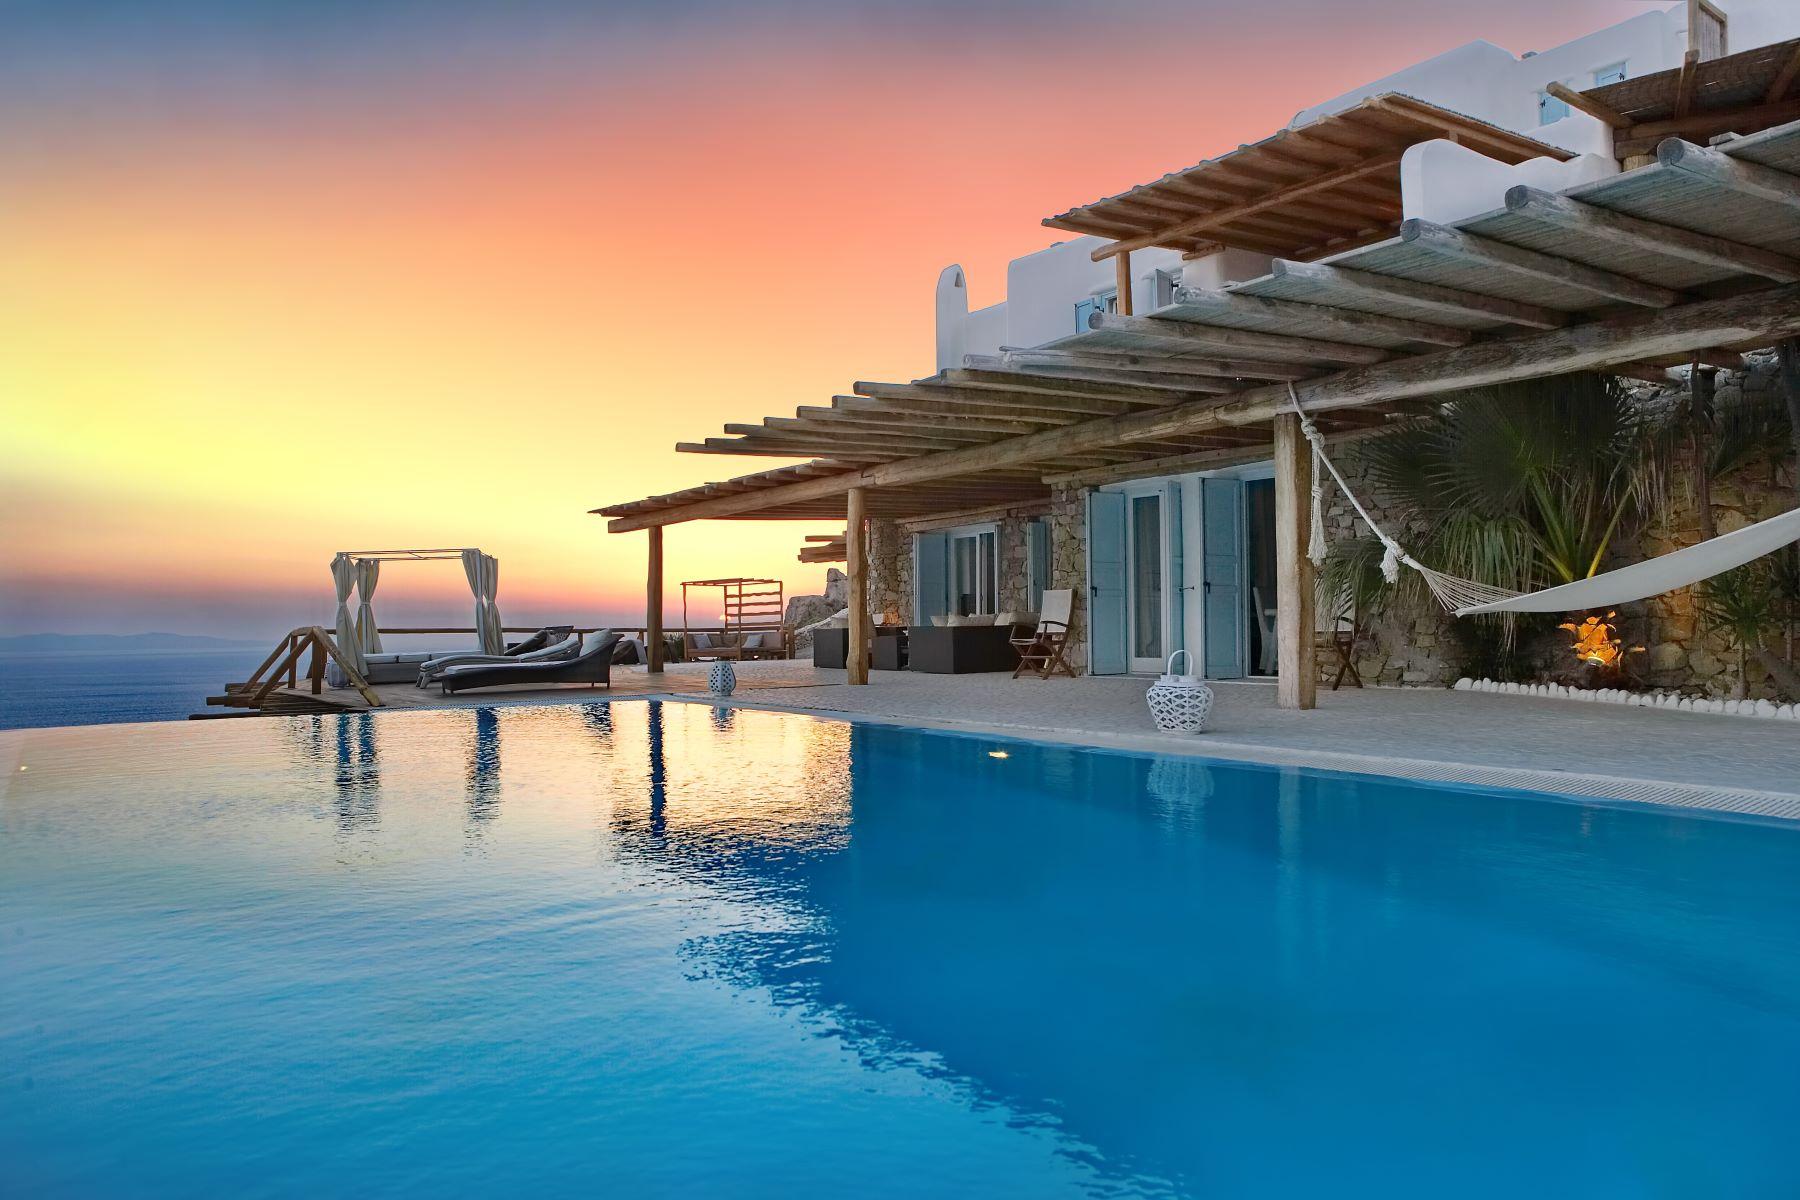 Single Family Home for Sale at Garden of Eden Mykonos, Southern Aegean, Greece